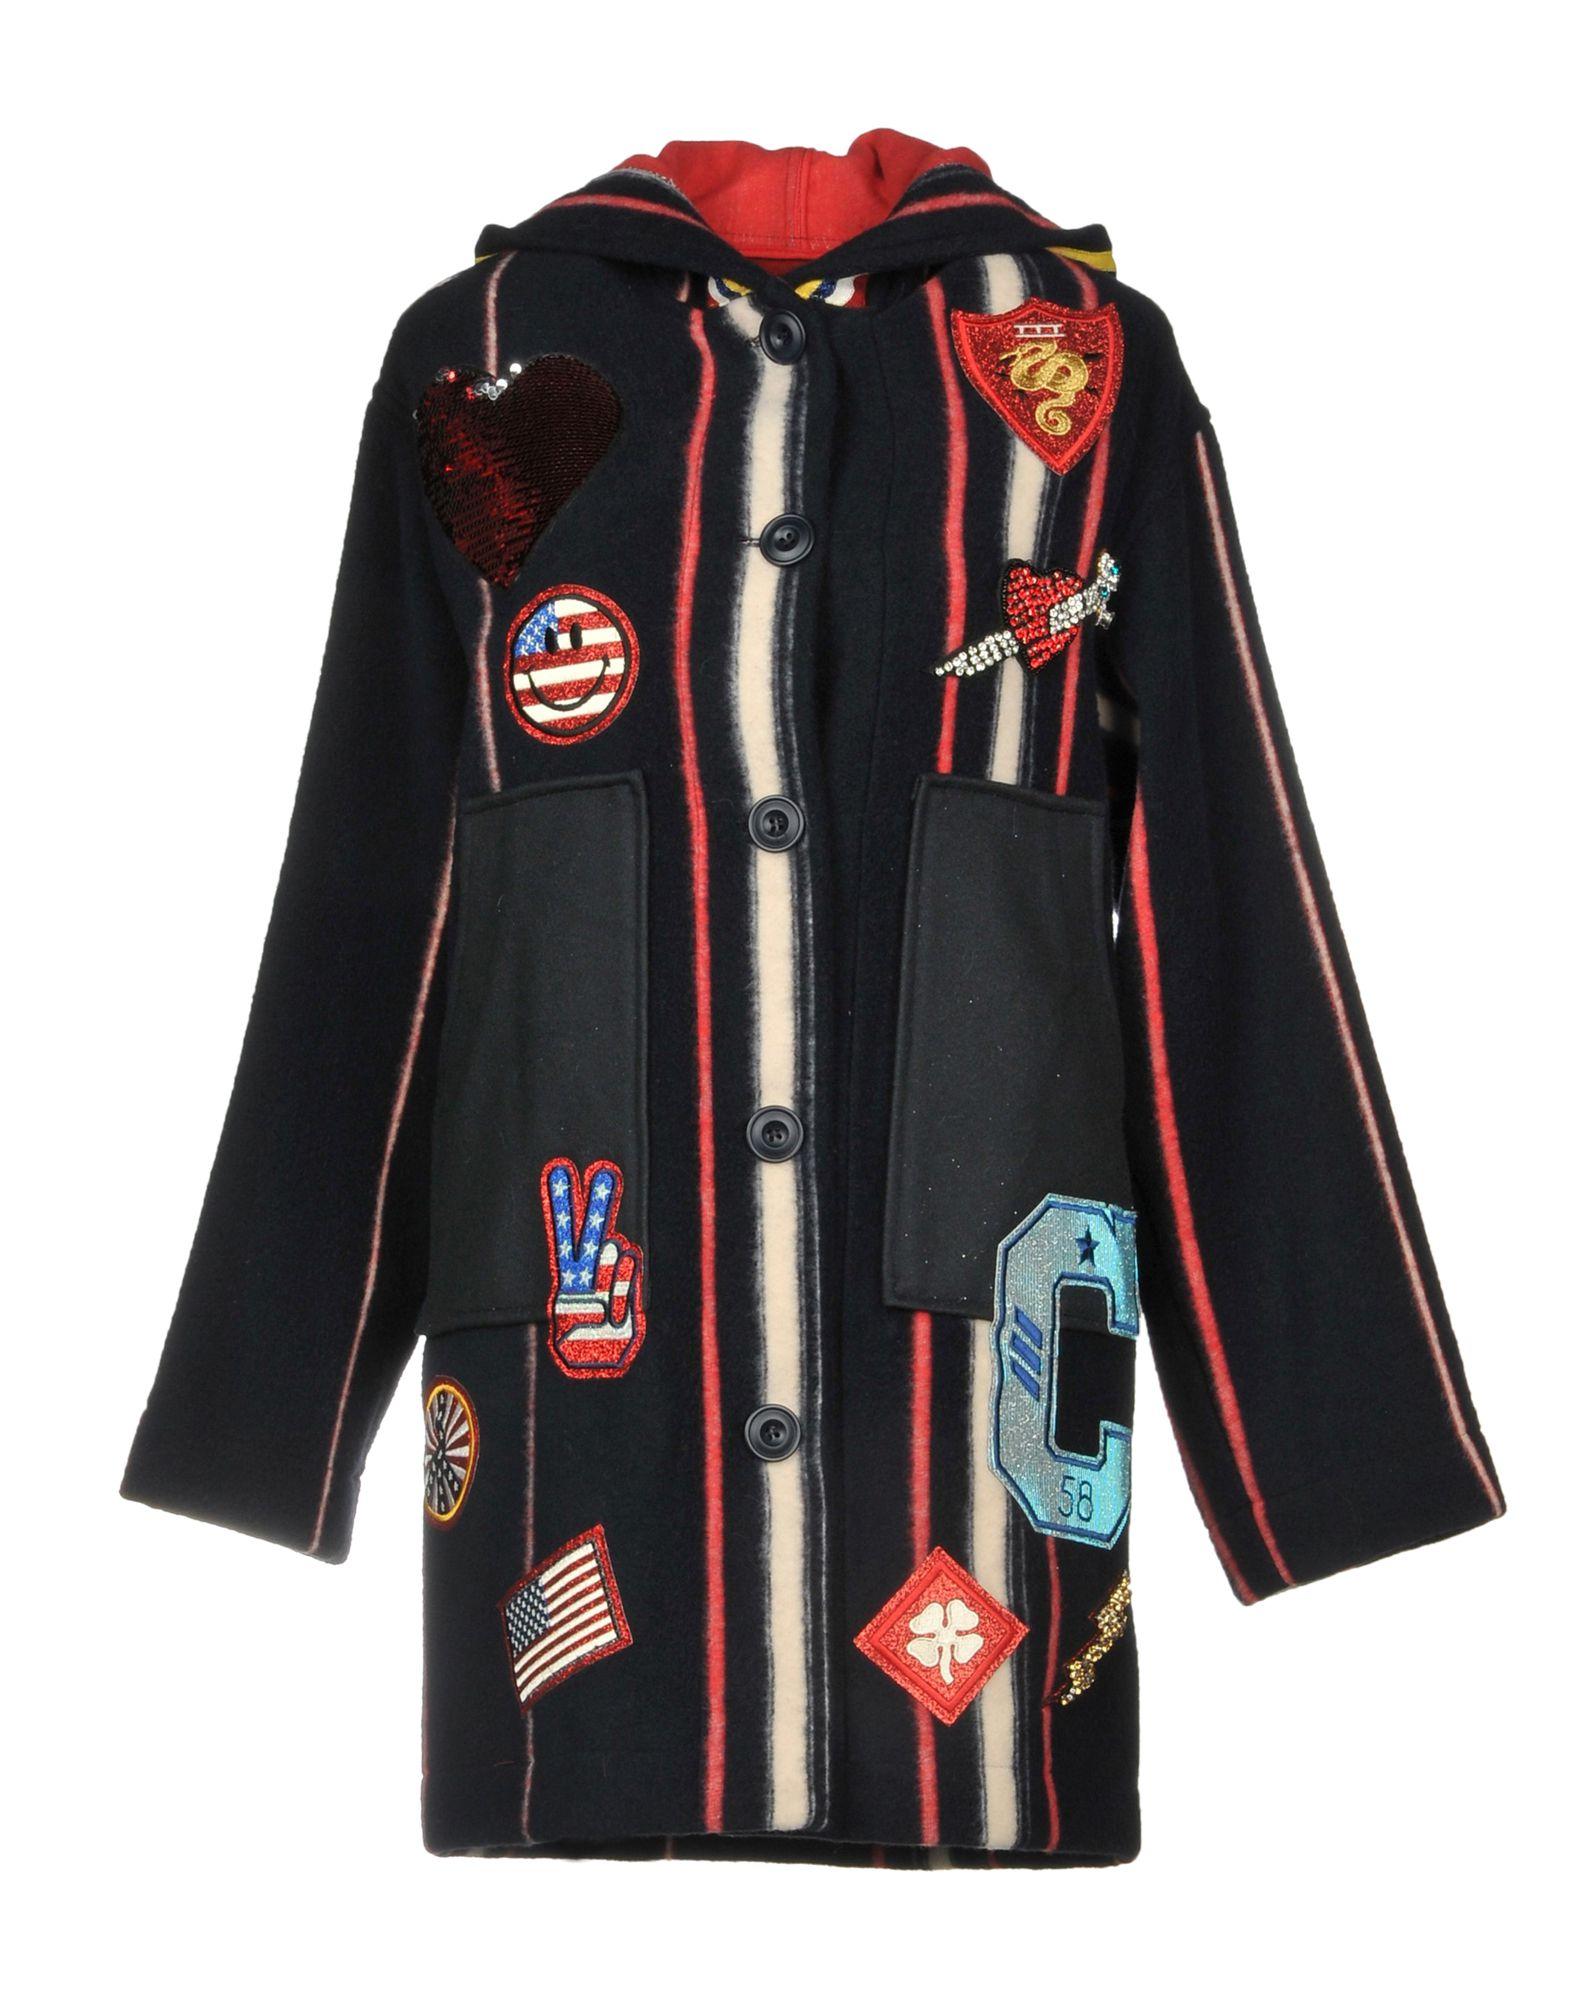 HISTORY REPEATS Пальто 2016 осенью дамы сукно slim шерстяные пальто в длинные пальто